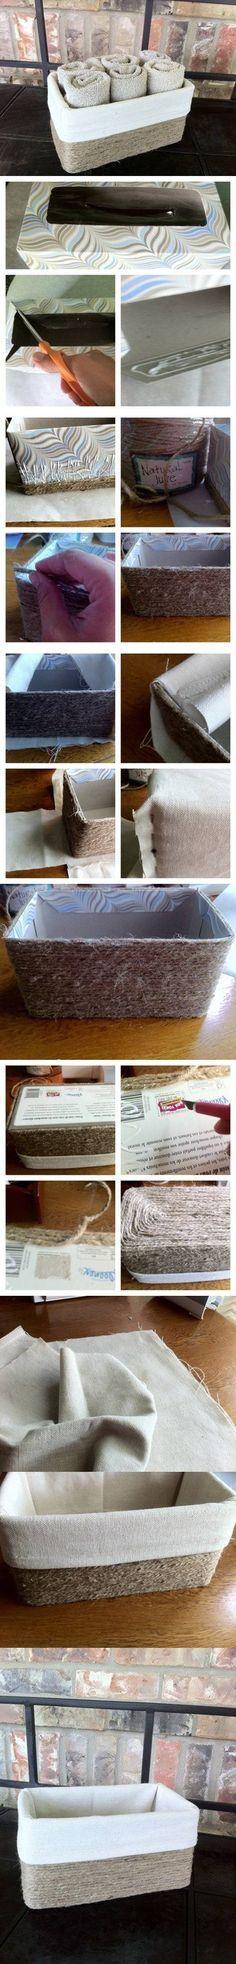 DIY Jute Basket from Cardboard Box